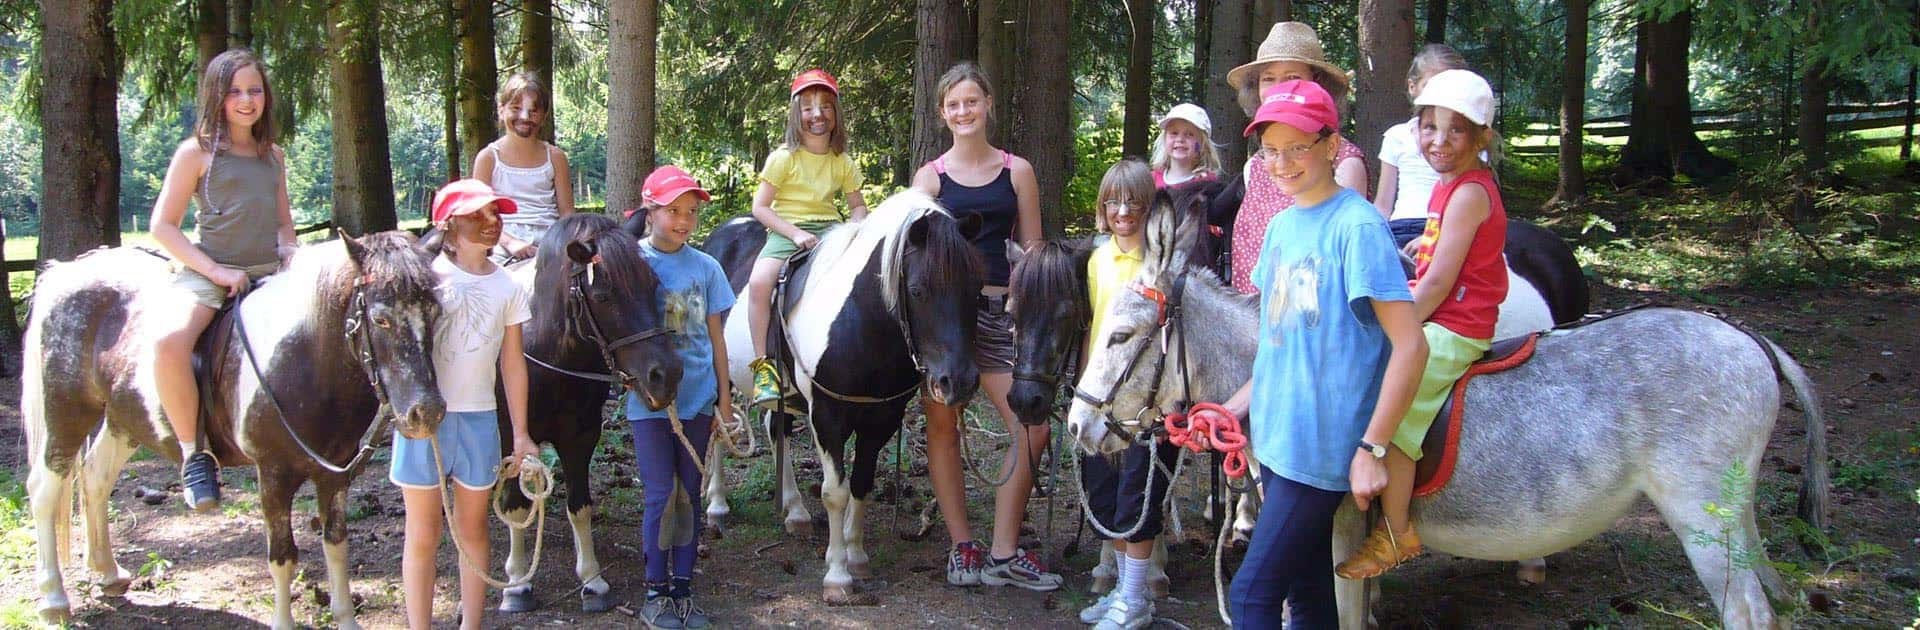 childcare with adventure program - Hotel Matschner